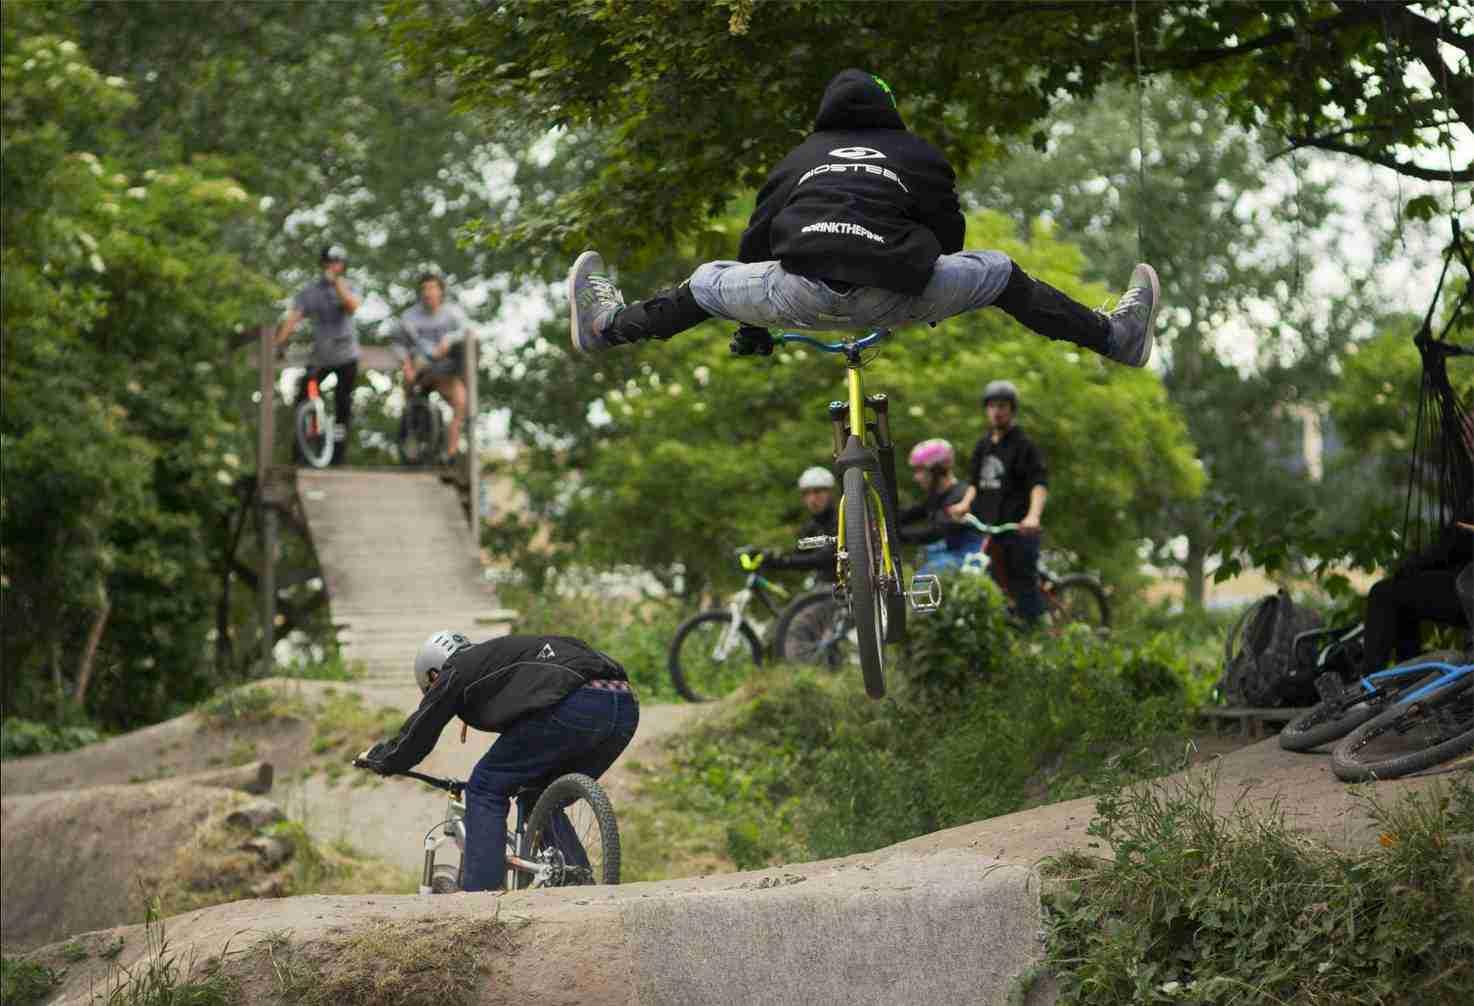 holmen-dirt-aktiviteter-dirtjump-bmx-pumptrack-rekreativ-social-friluftsliv-cykelleg-sikker-cyklist-København-Copenhagen-Christianshavn-cykel-dirt-jump-23